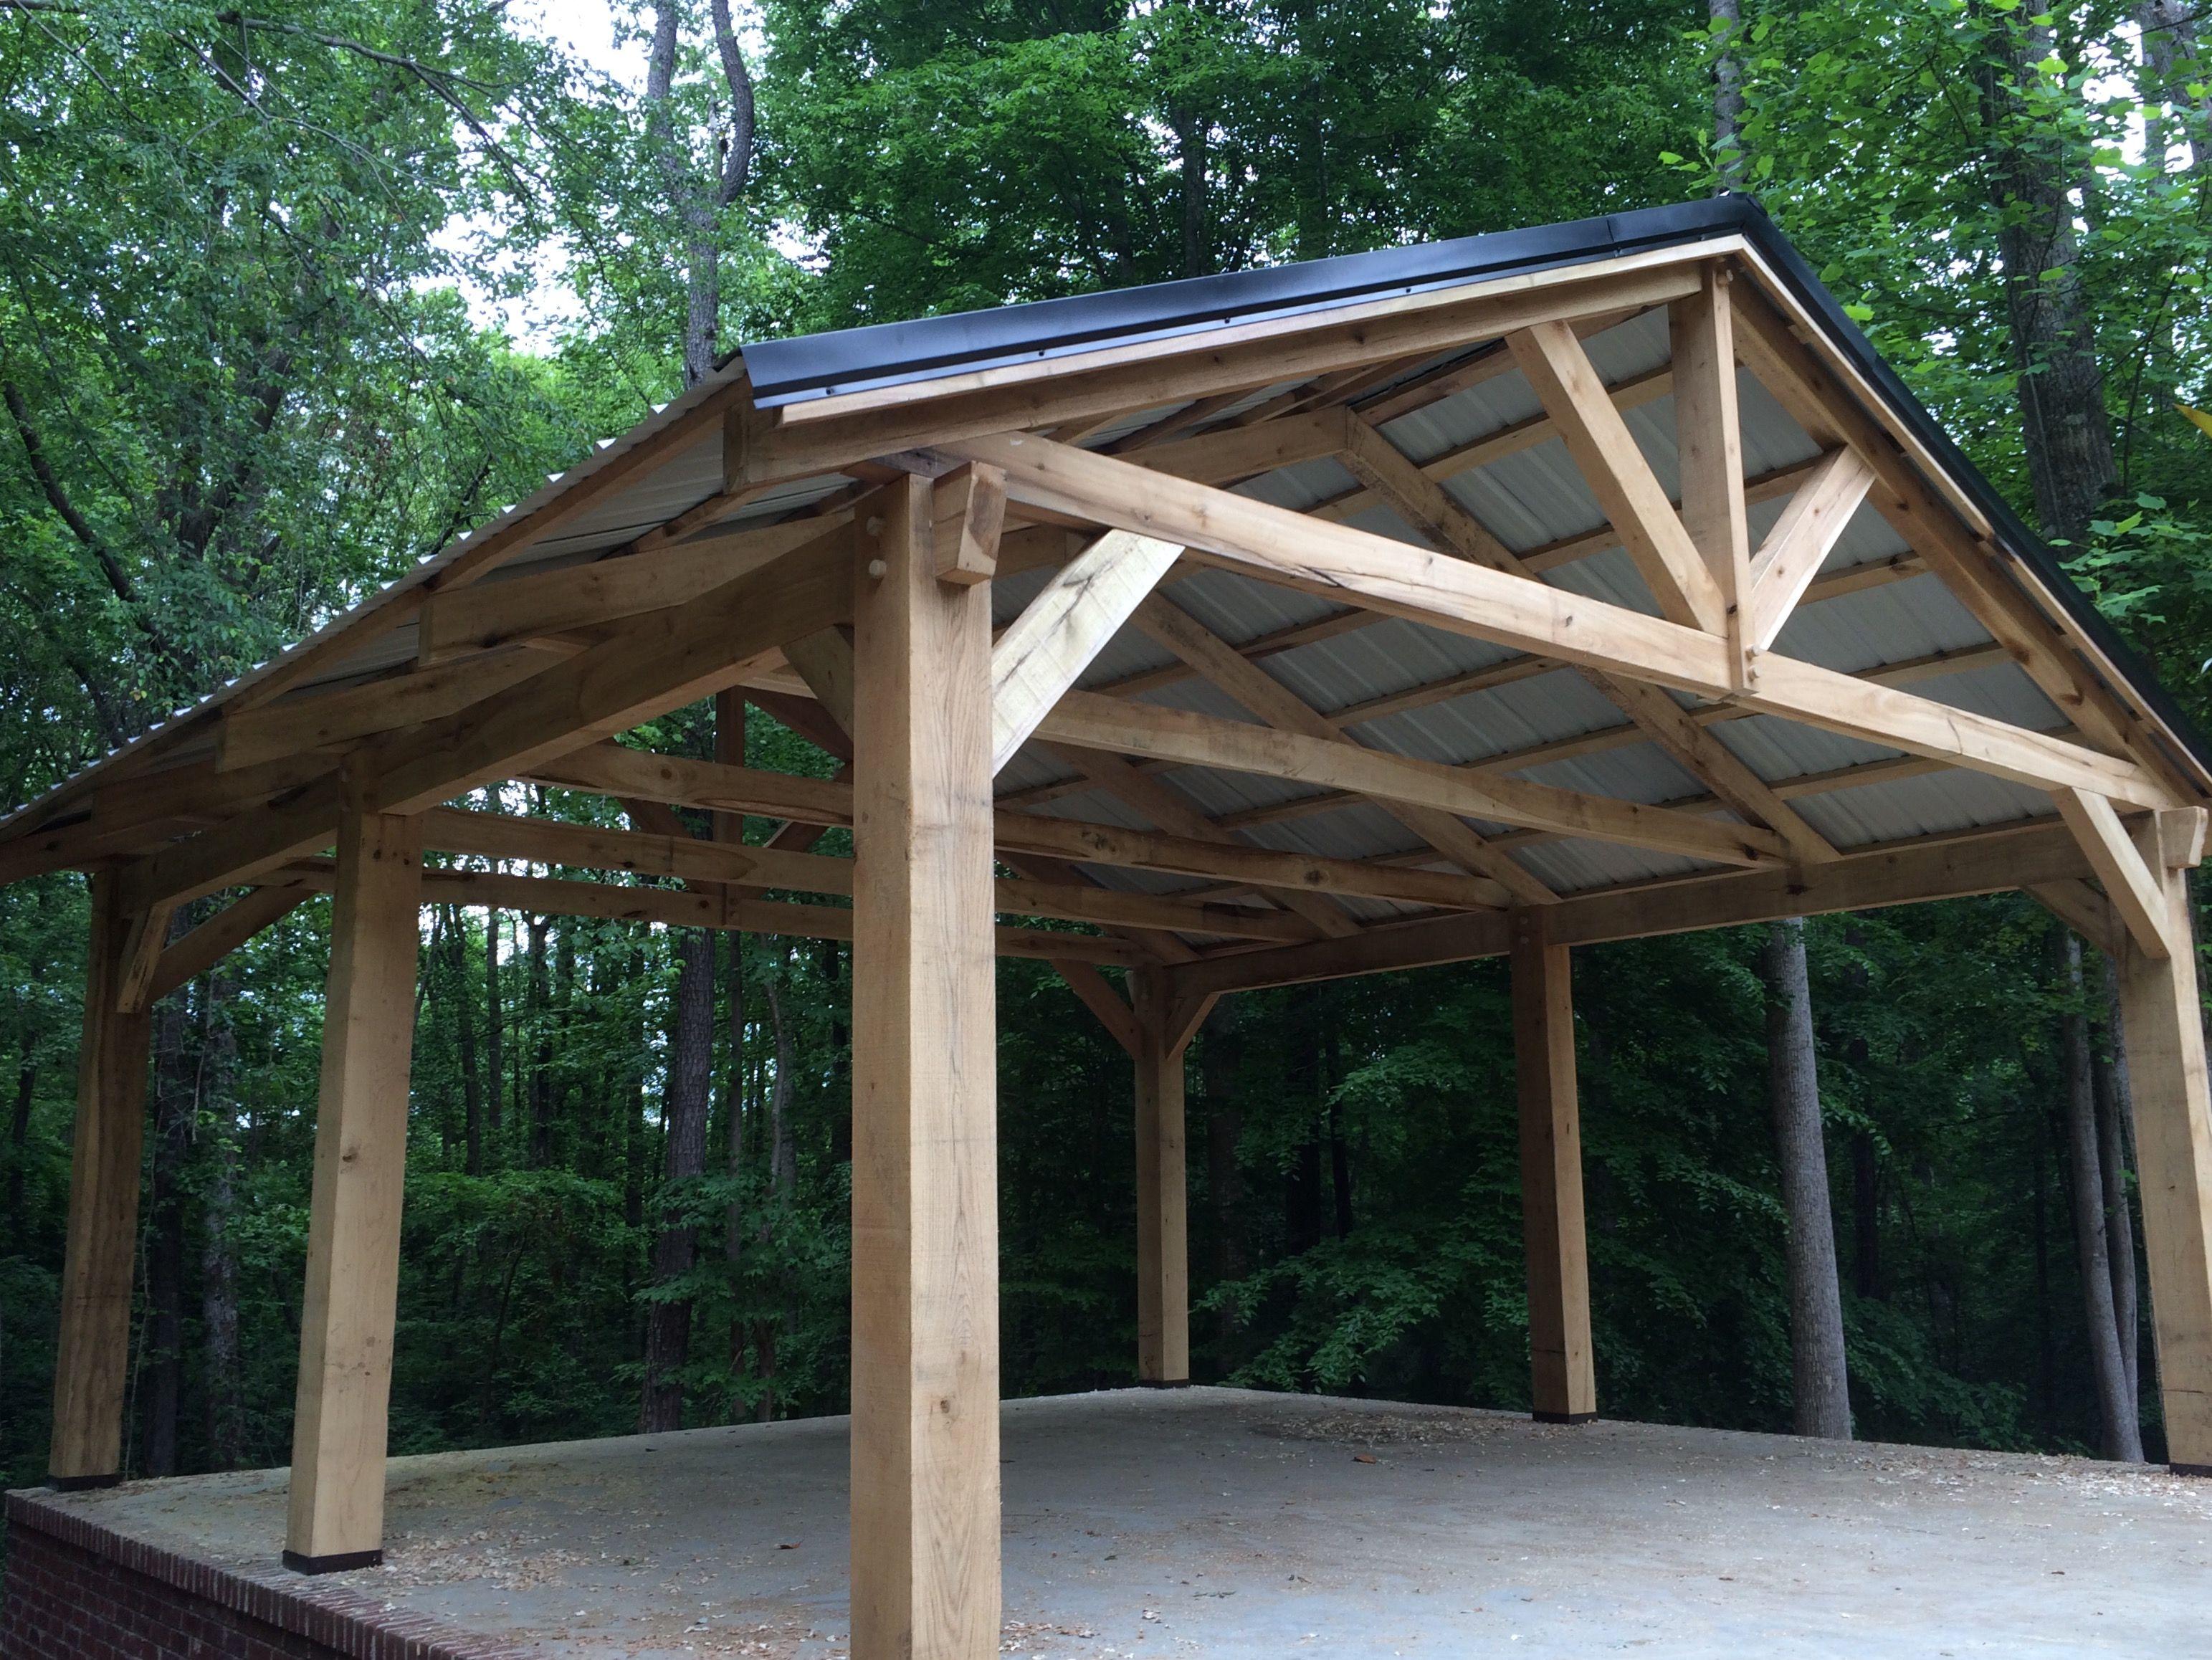 2 560 16x16x8 Kit 4 000 20x20x8 Kit 256 390 3300 With Images Backyard Pavilion Backyard Patio Designs Carport Designs